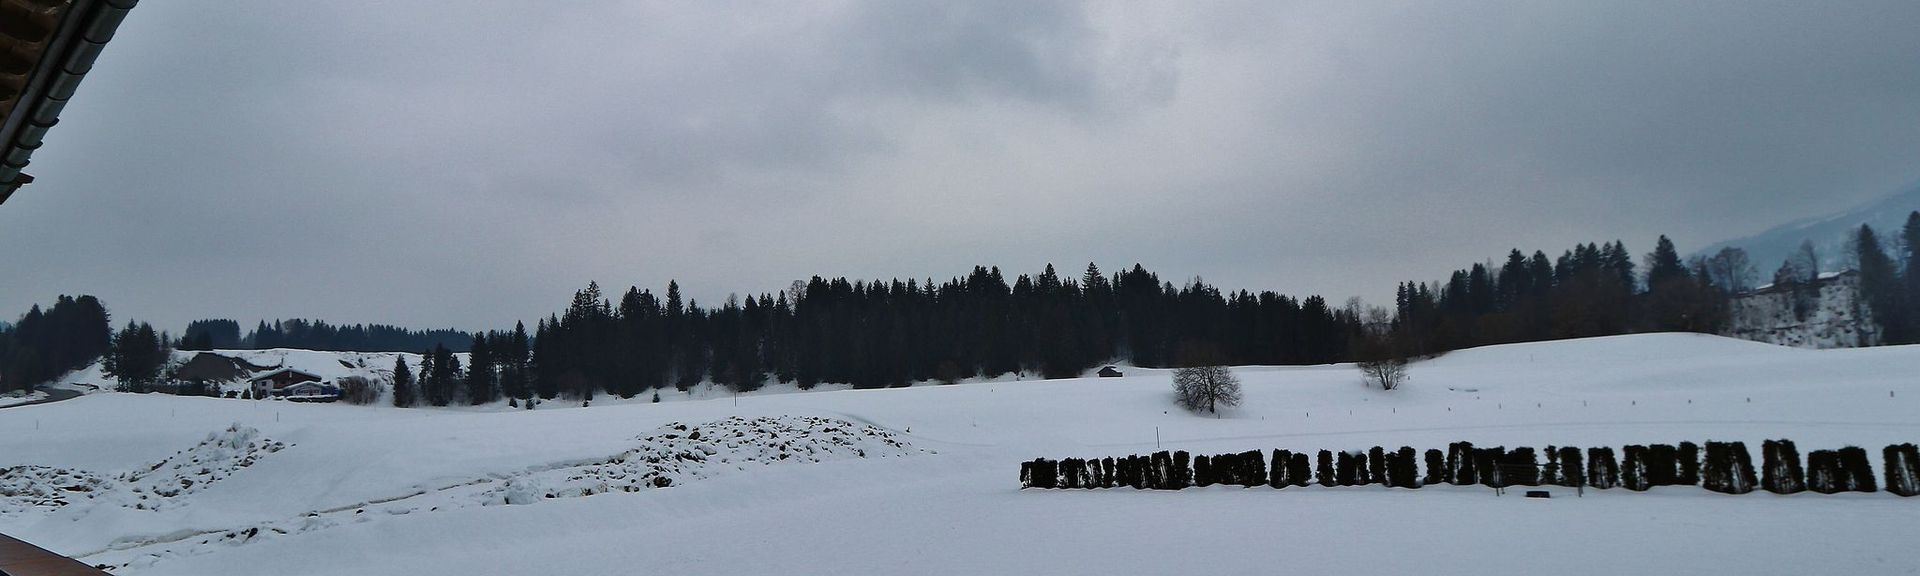 Kirchdorf in Tirol, Tirol, Oostenrijk